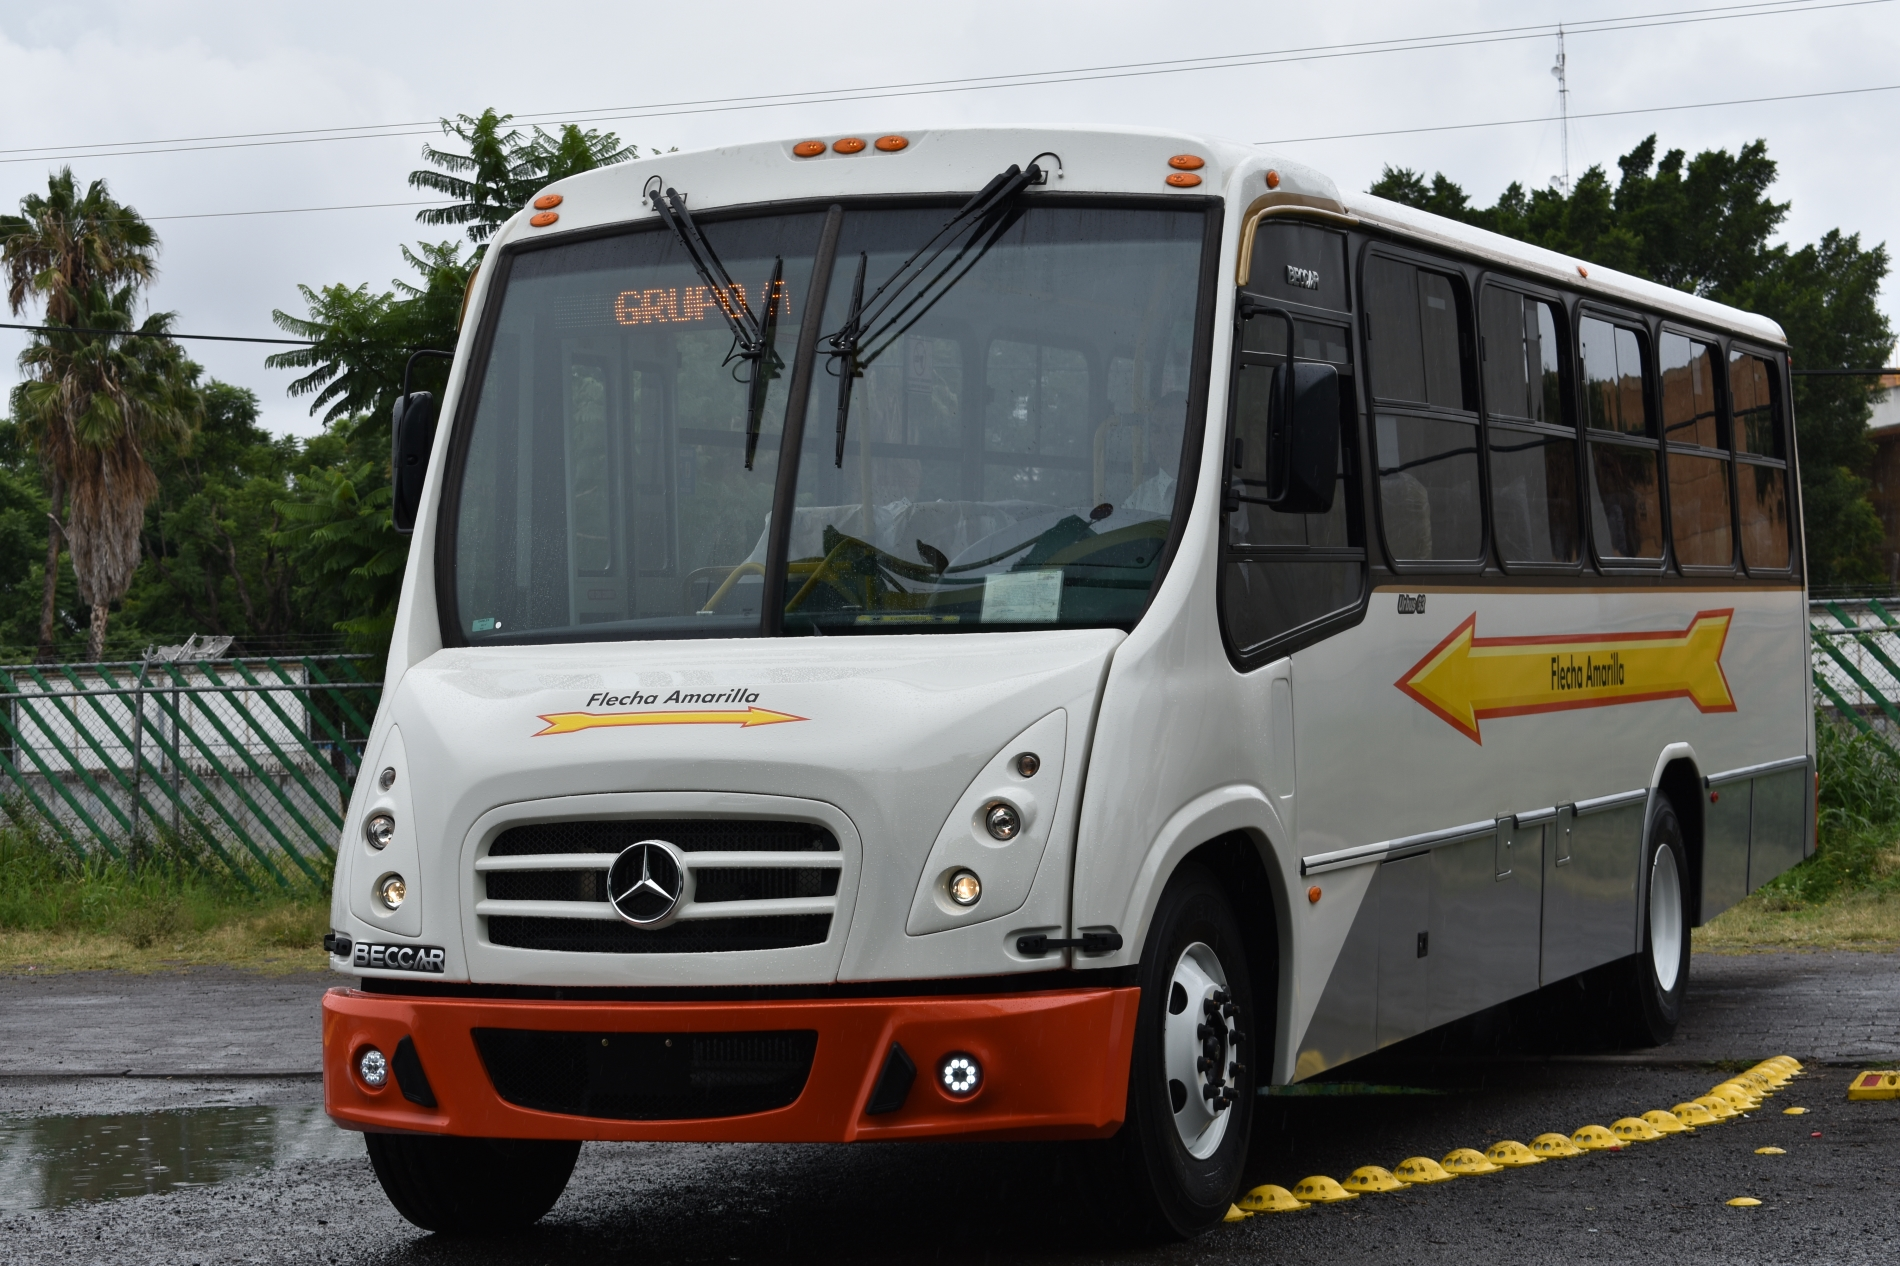 354 nuevos autobuses Mercedes-Benz para Grupo Flecha Amarilla